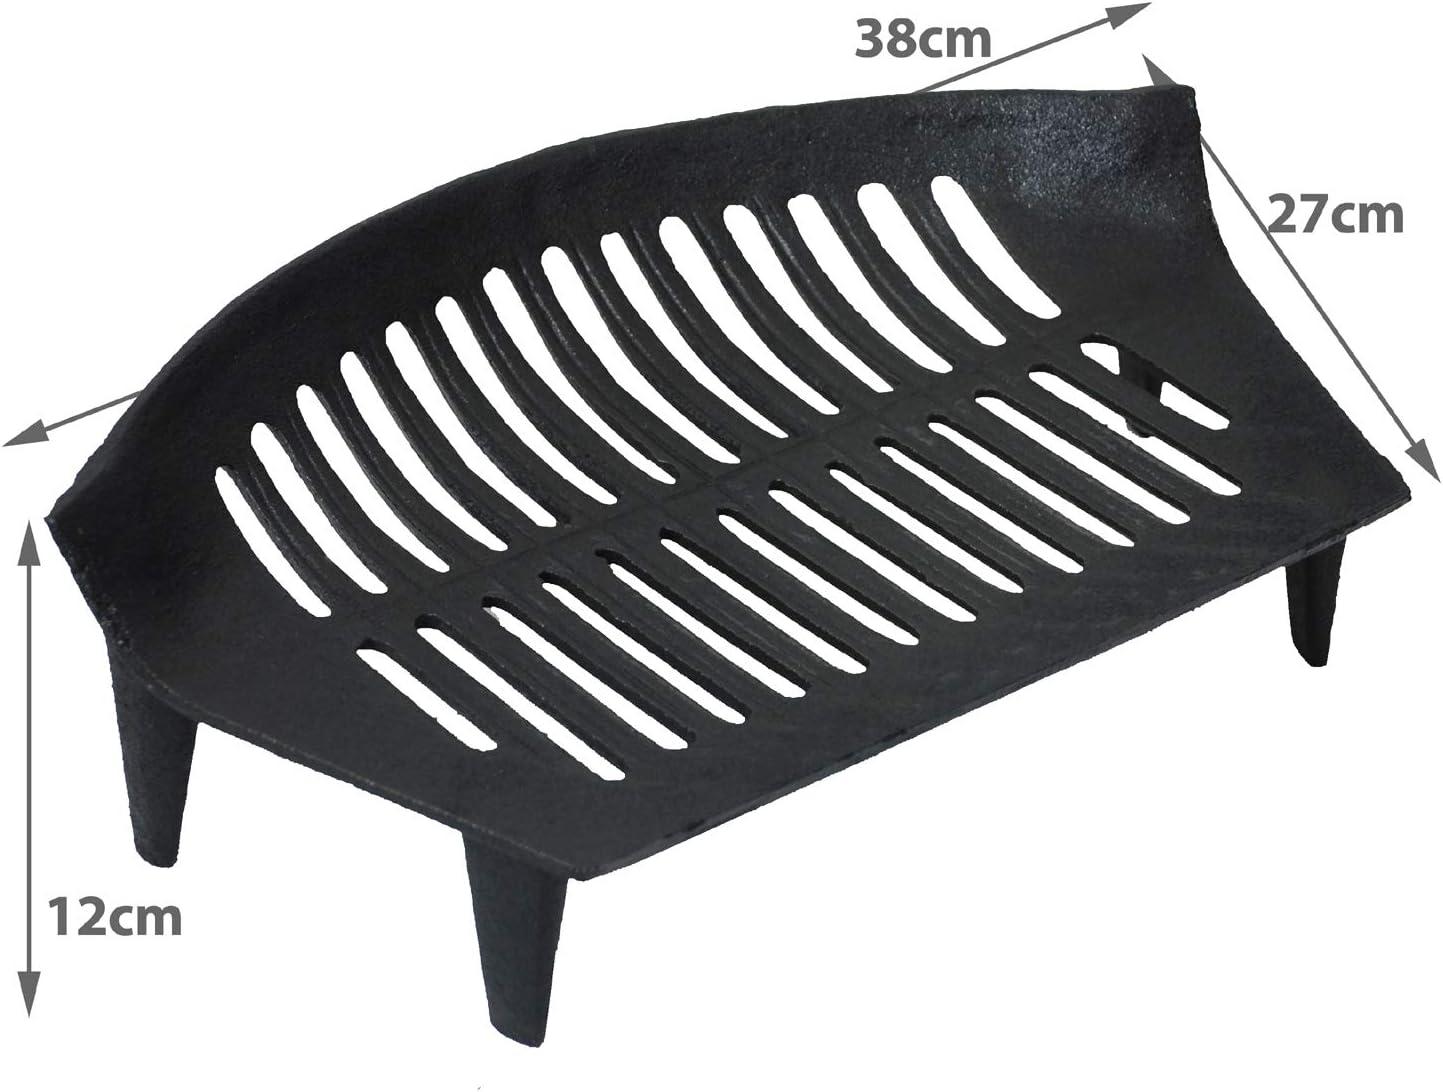 W x 31cm Sturdy Fireplace Accessory L x 44.5cm simpa Hamptons LARGE Black Fire Coal Log Grate Basket 18cm H